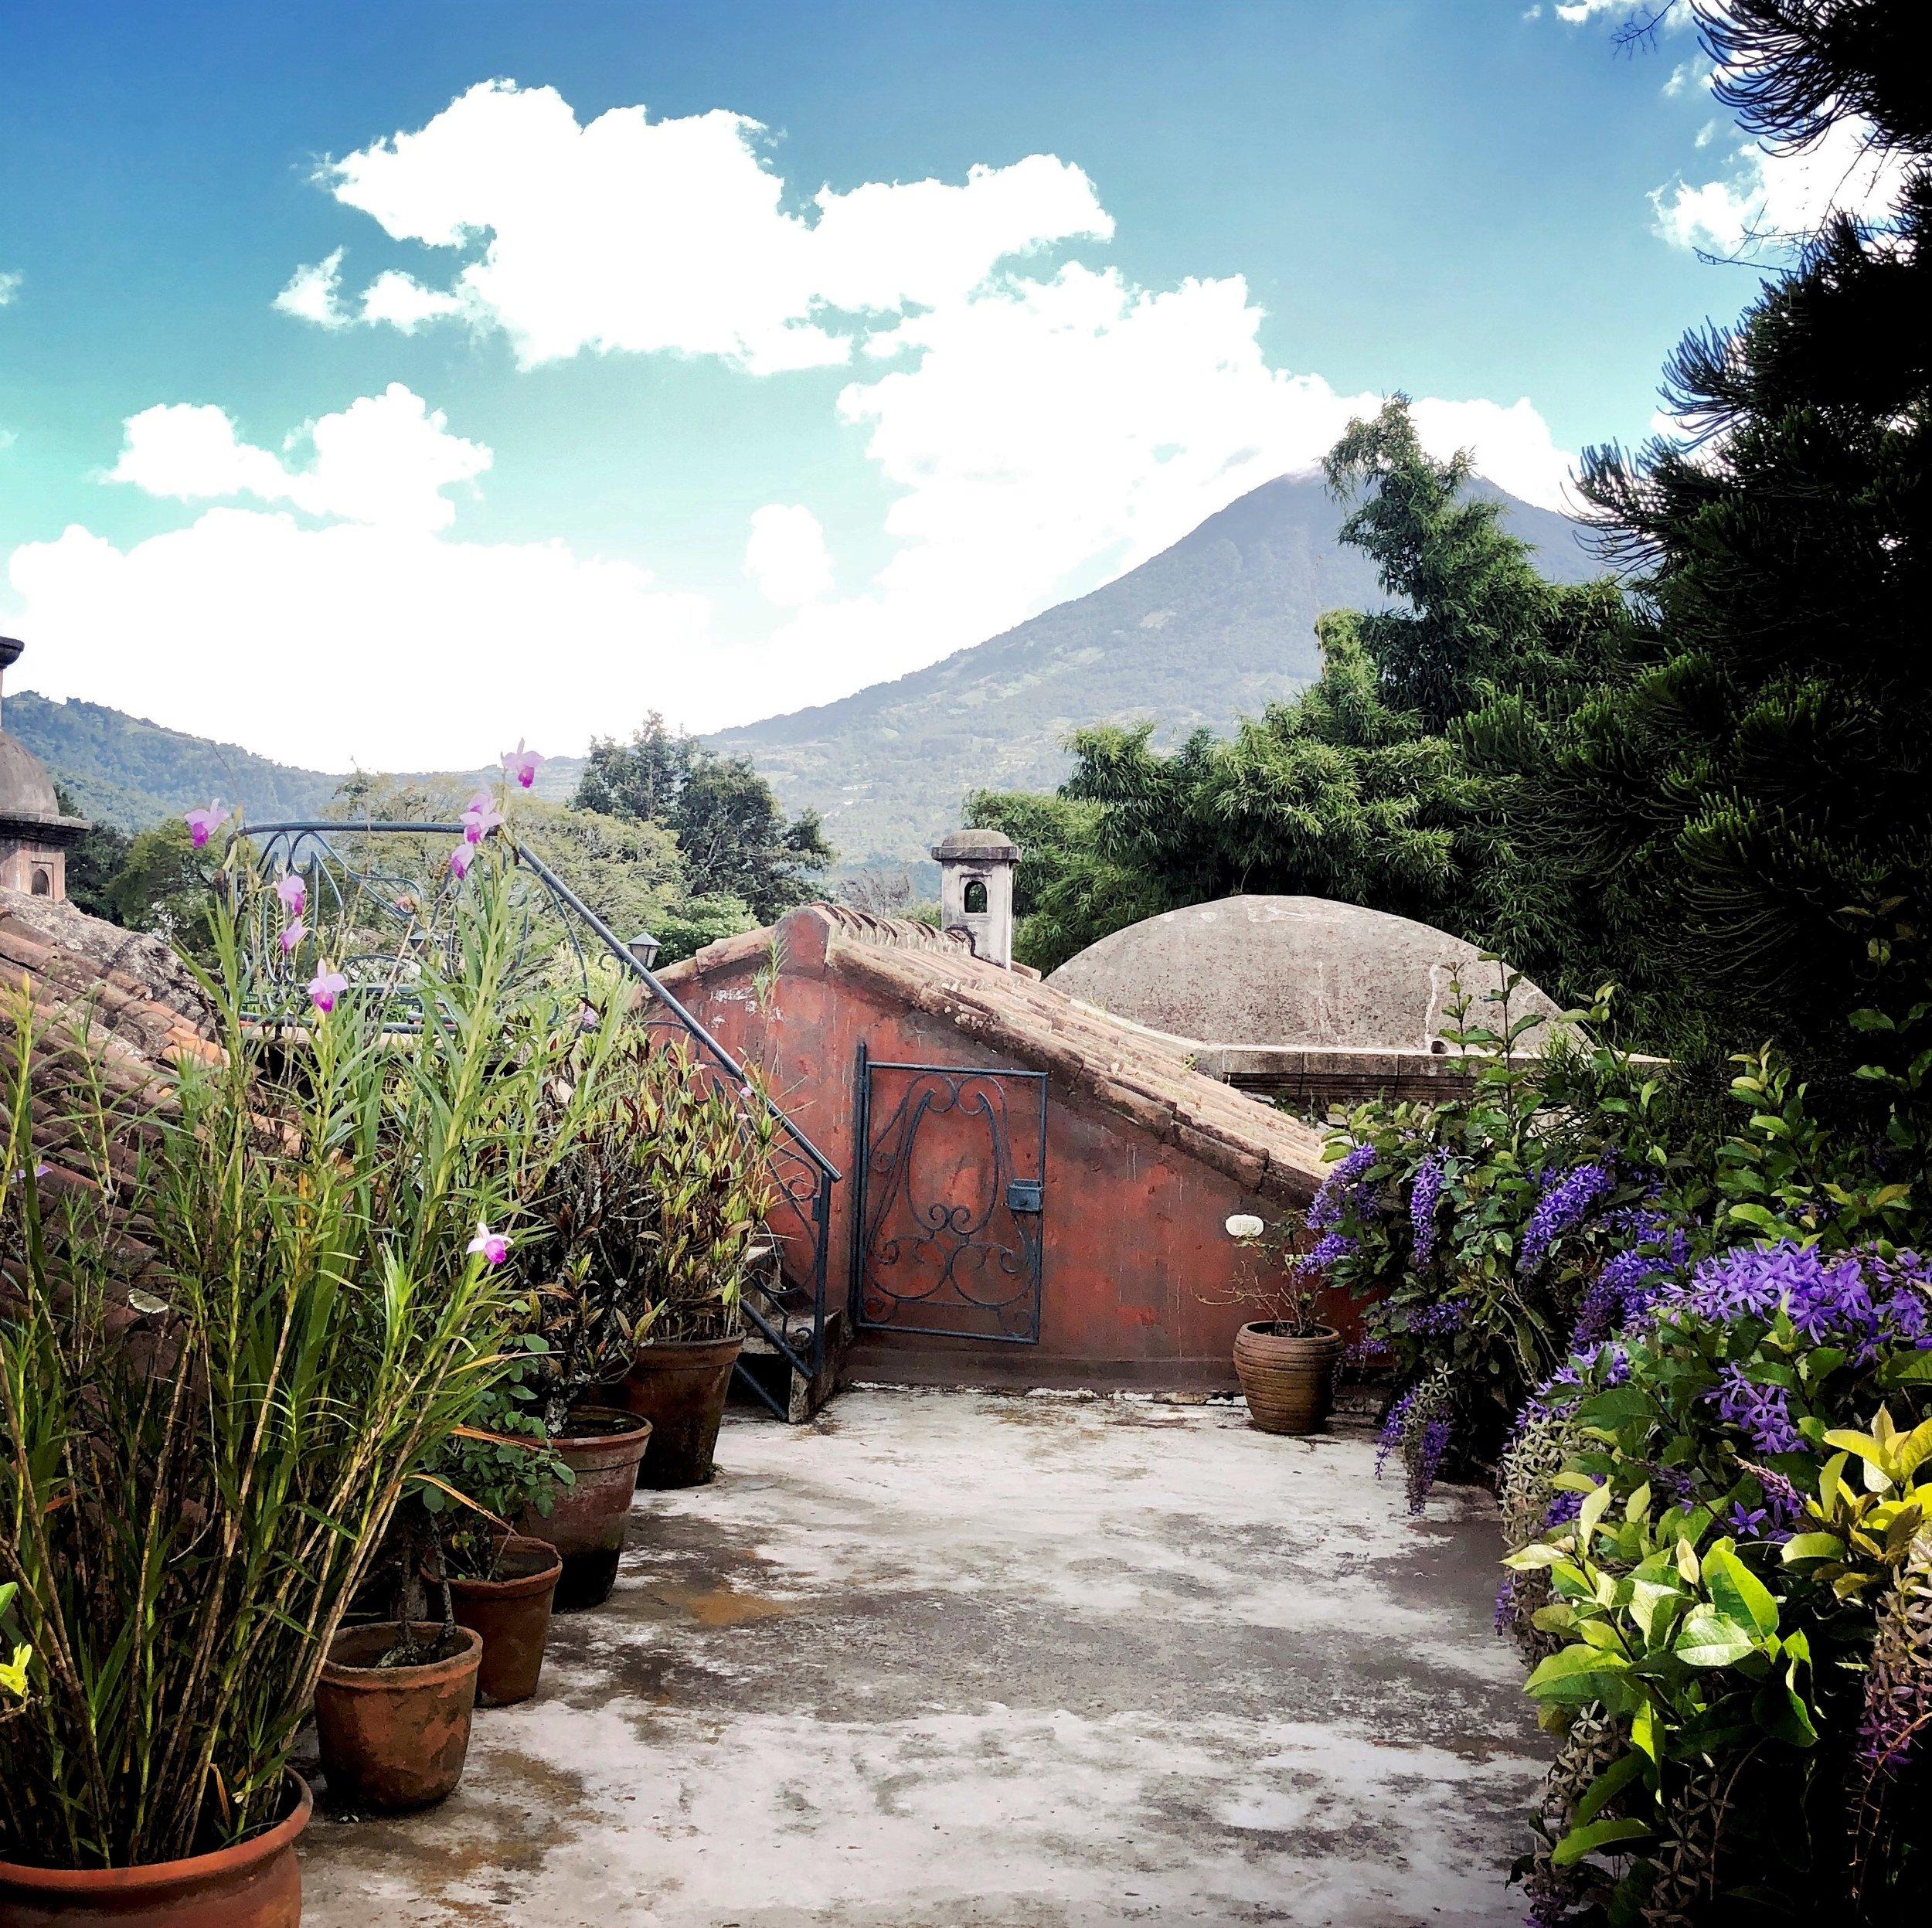 Open Air Places - Meson Panza Verde 5.29.JPG